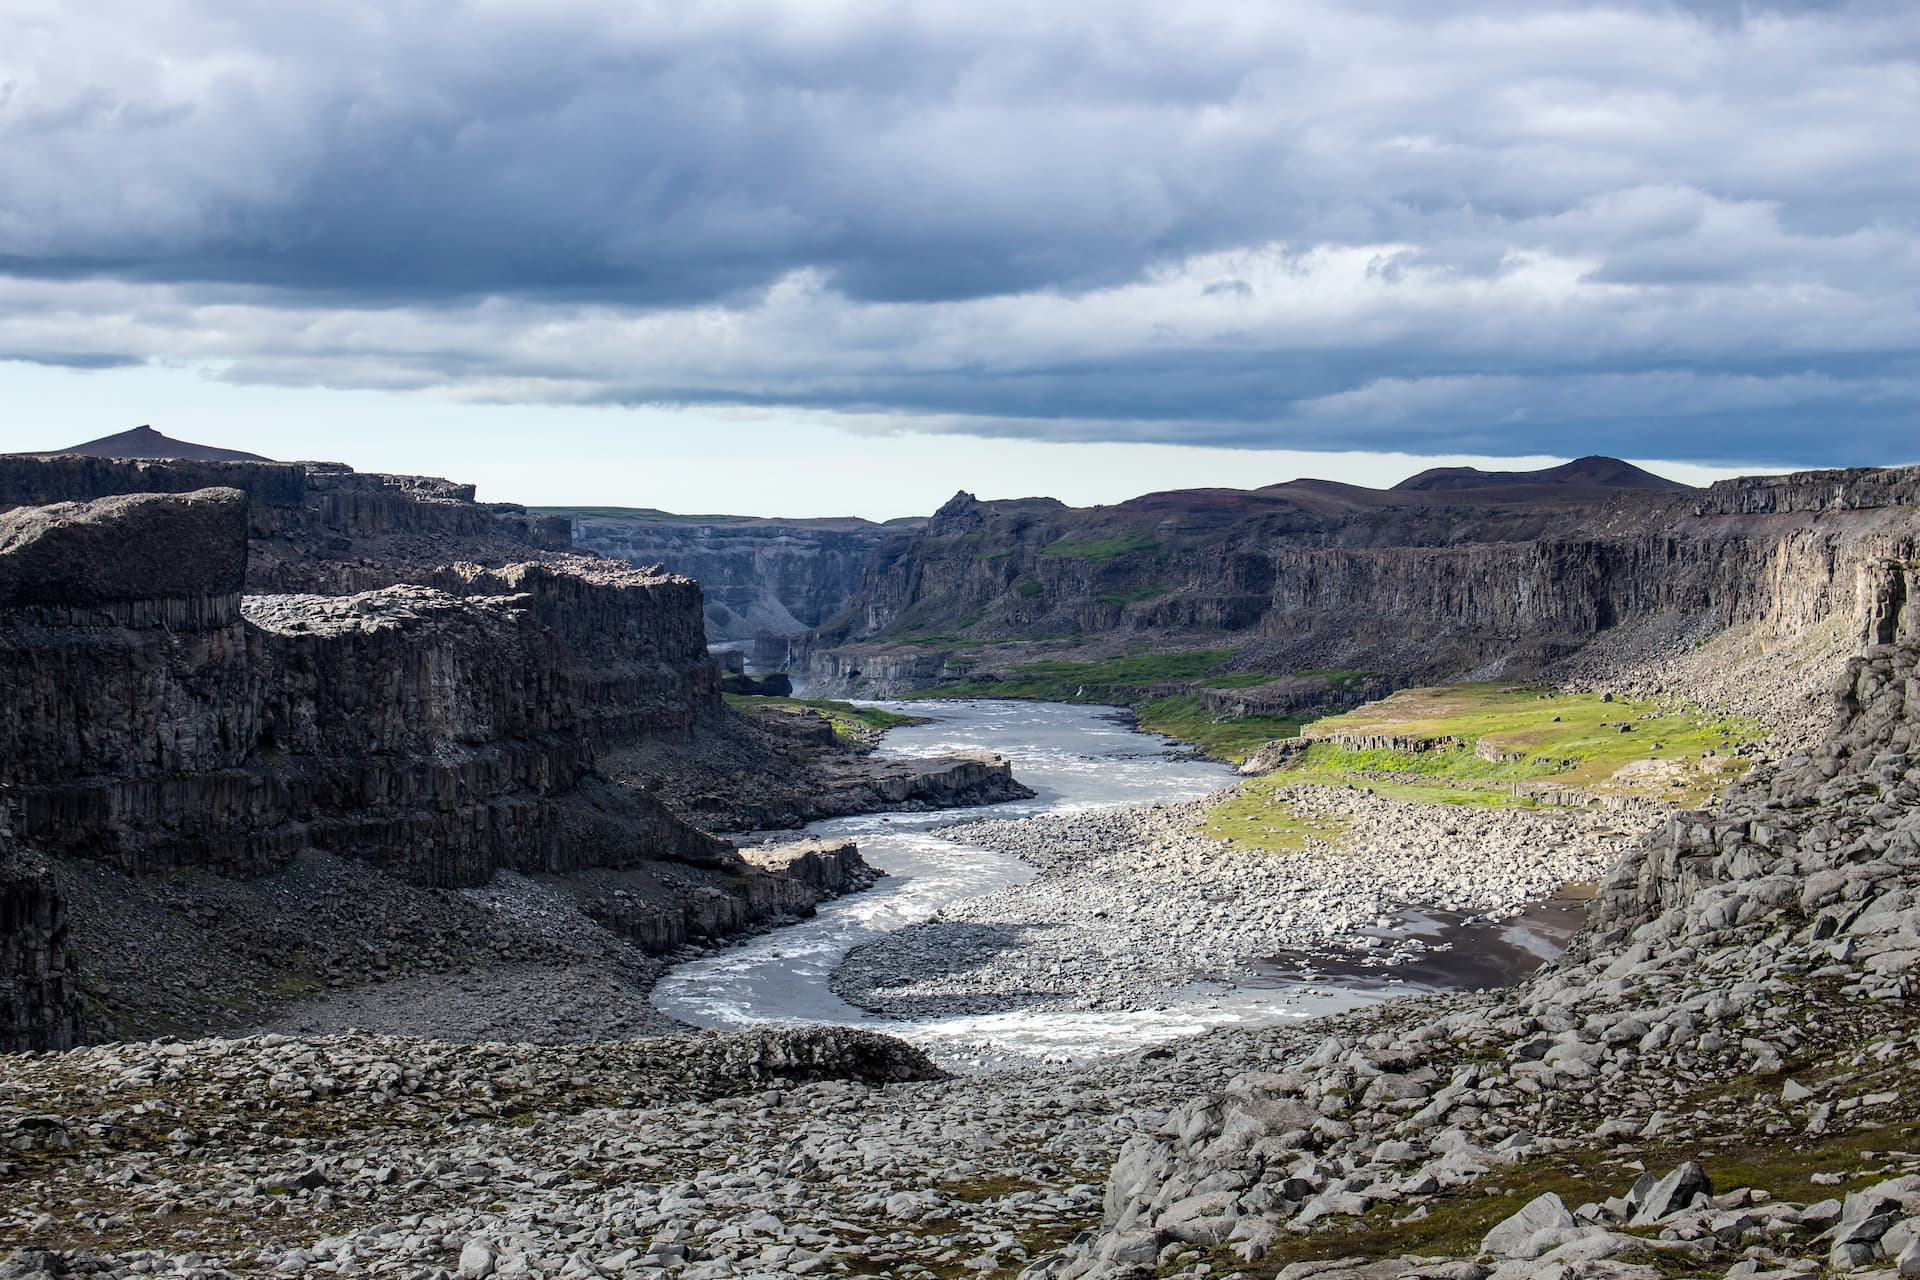 Peisaj spectaculos în Parcul Național Vatnajökull